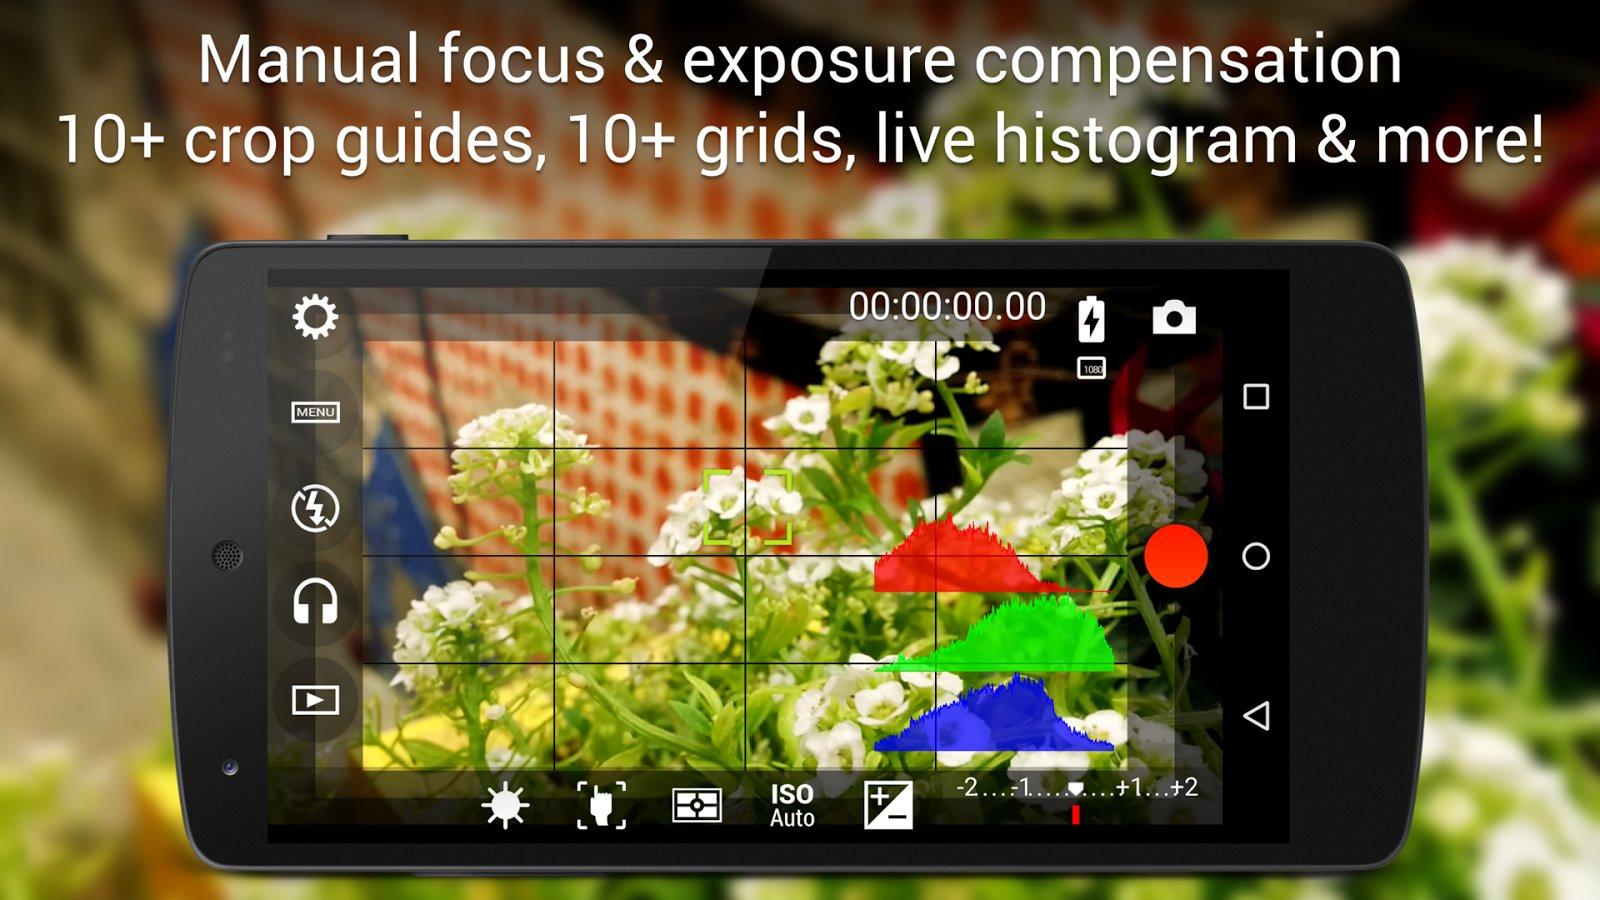 Cinema fv 5 pro apk free download / Watch free online pretty little